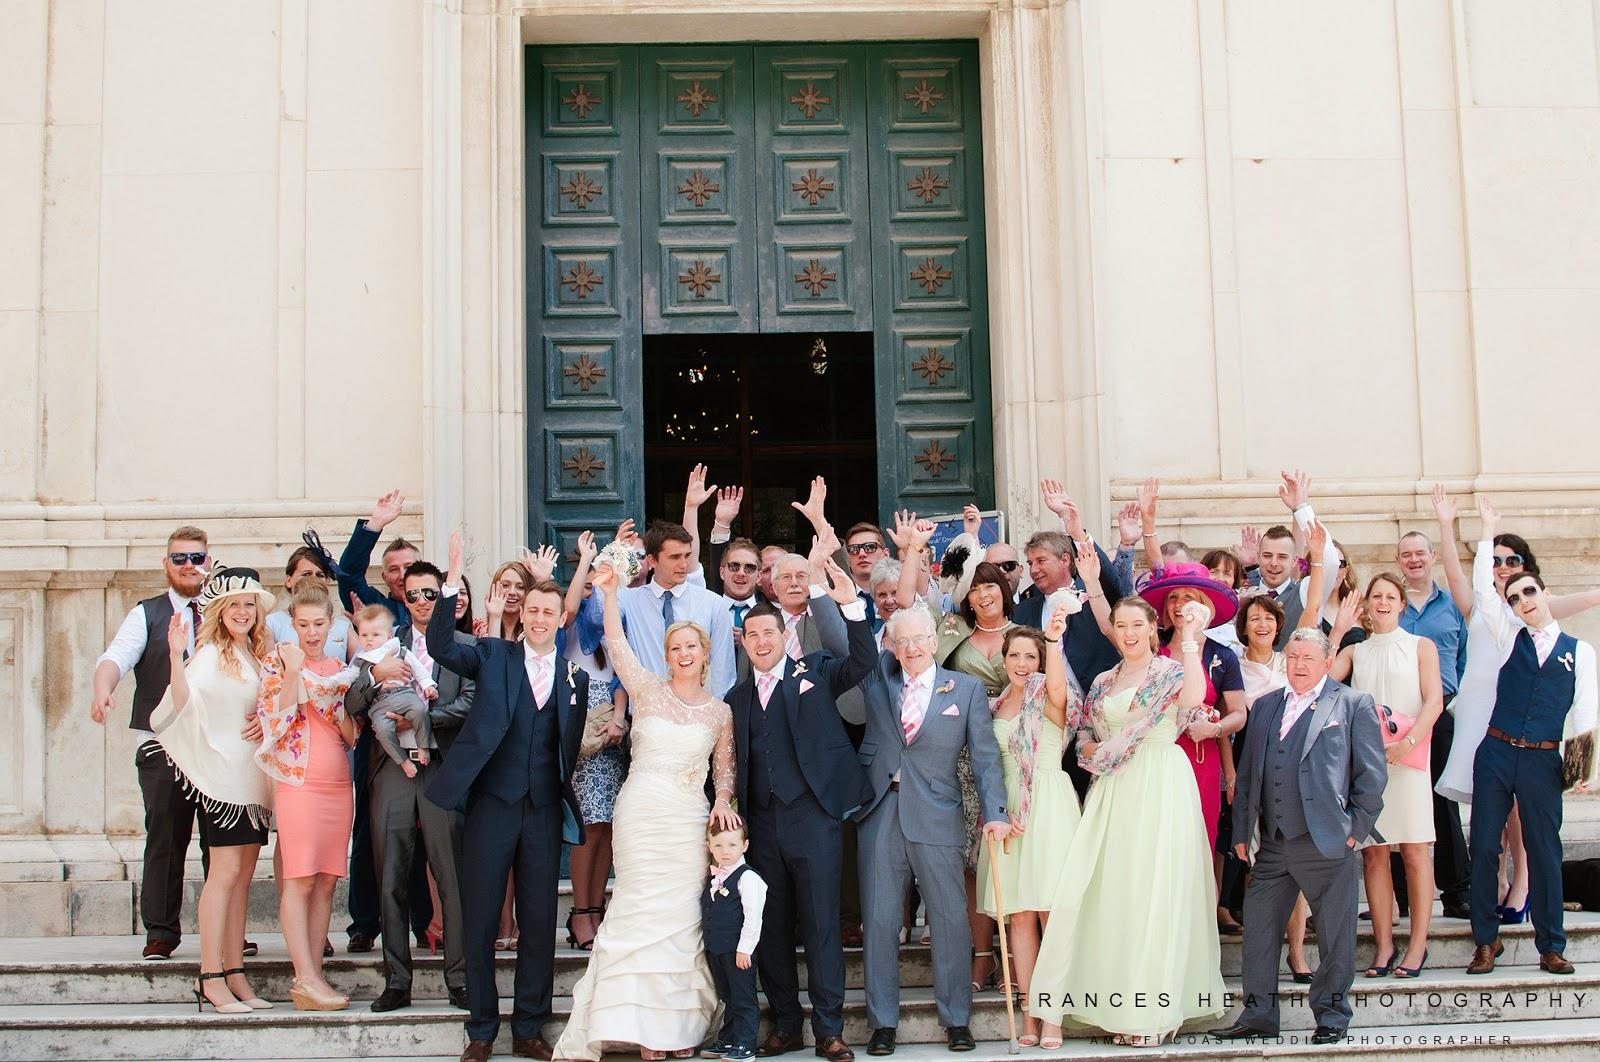 Group wedding photo in Positano